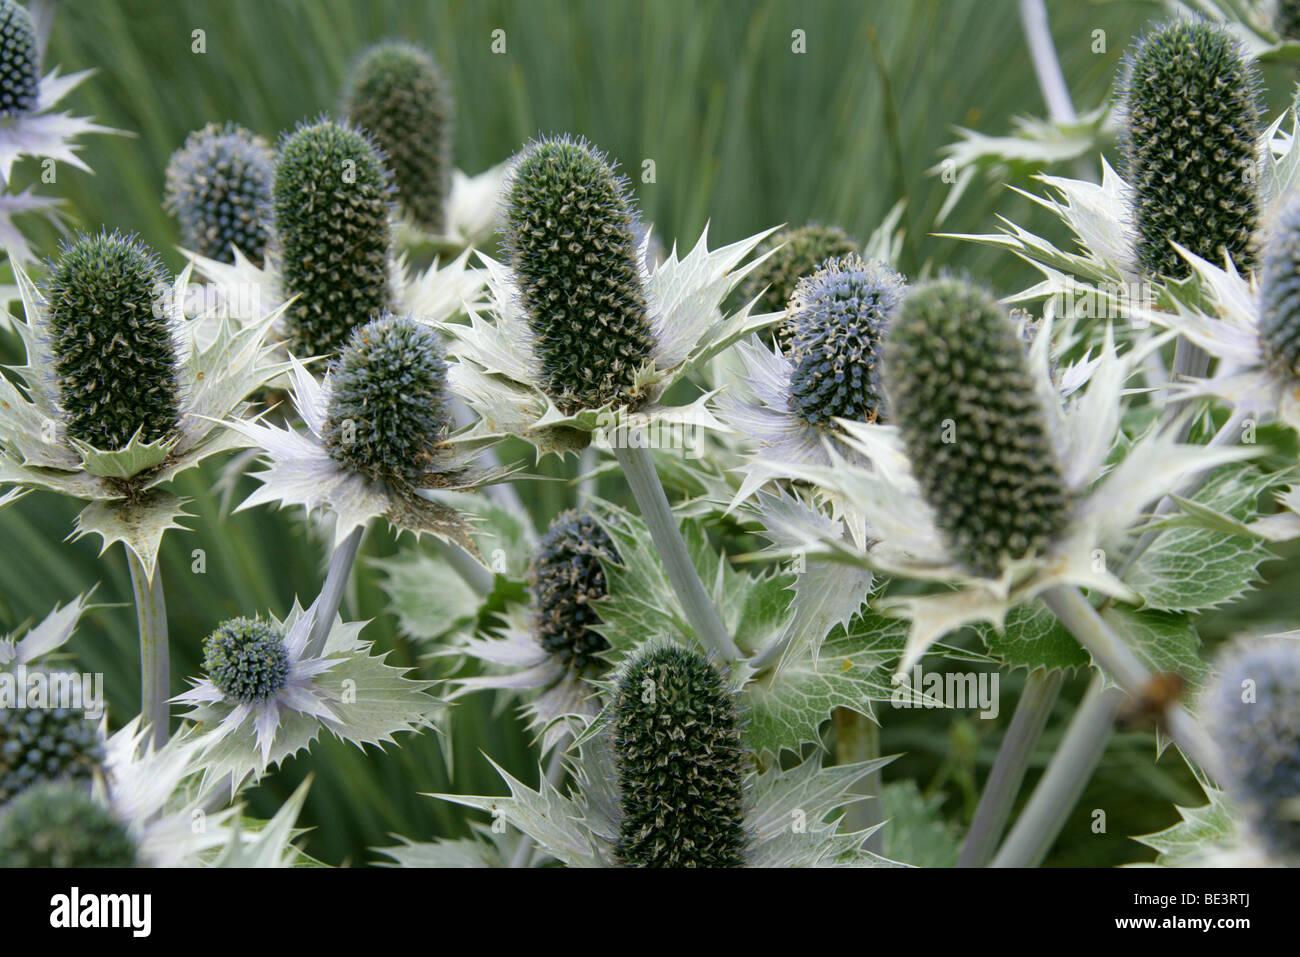 Giant Sea Holly, Eryngium giganteum 'Silver Ghost', Apiaceae - Stock Image